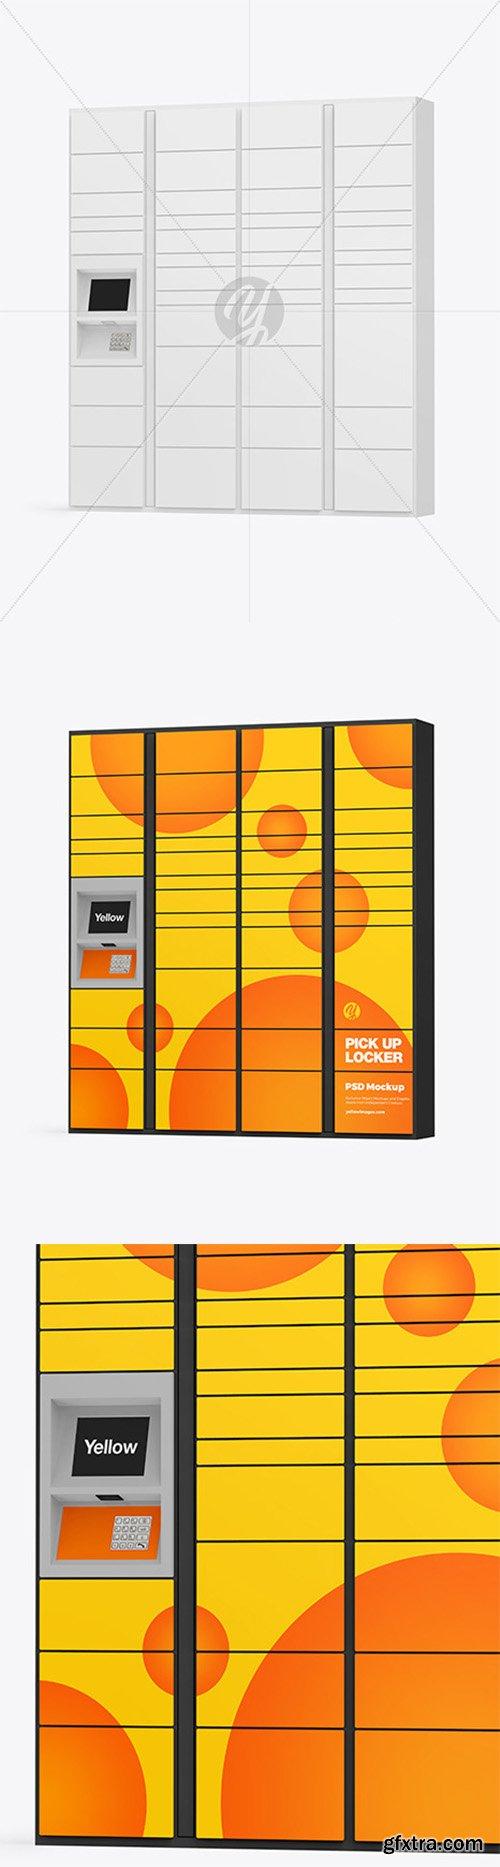 Pick Up Locker Mockup 80214